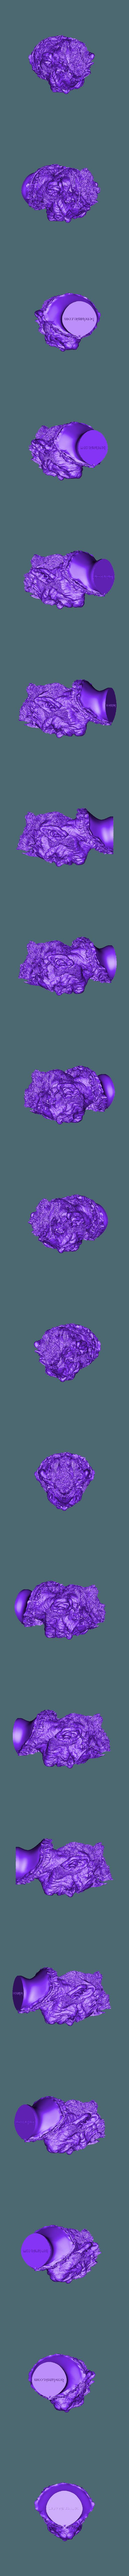 Orc_Chief_Nakhbruh_HighRes.stl Télécharger fichier STL gratuit Le chef orc Nakhbruh • Objet imprimable en 3D, bendansie